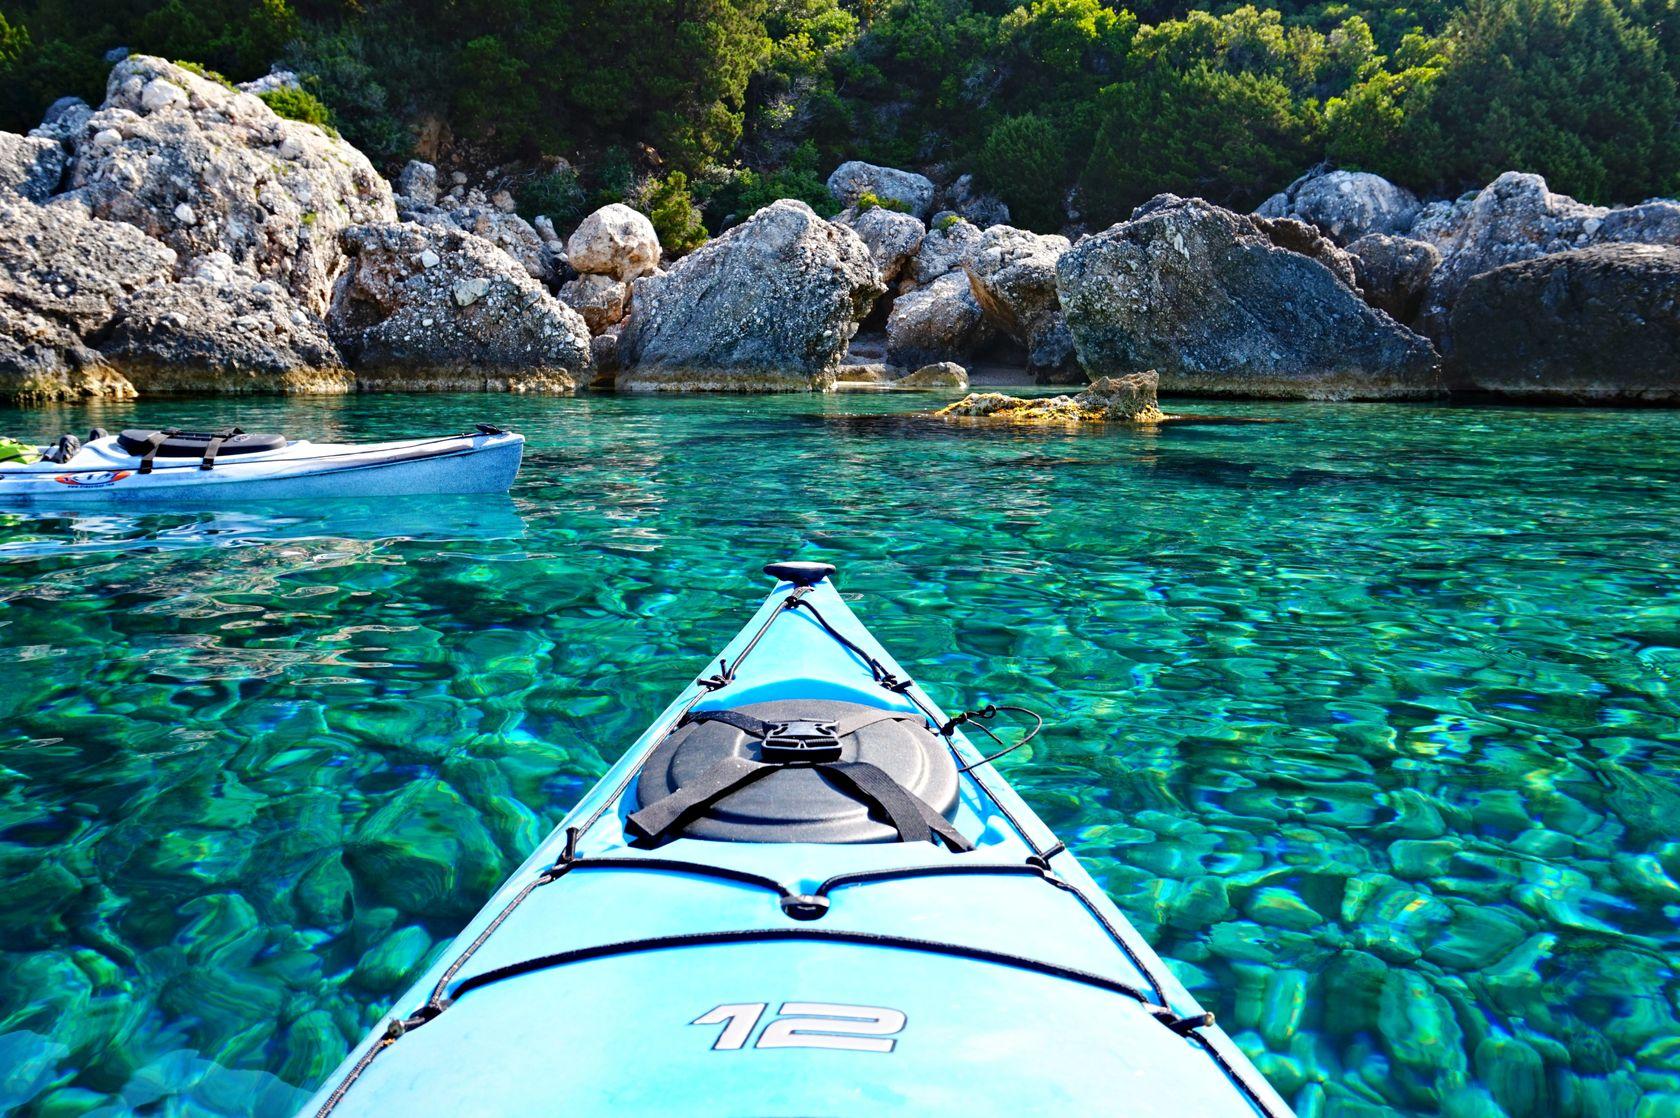 Fiskardo Kayaking